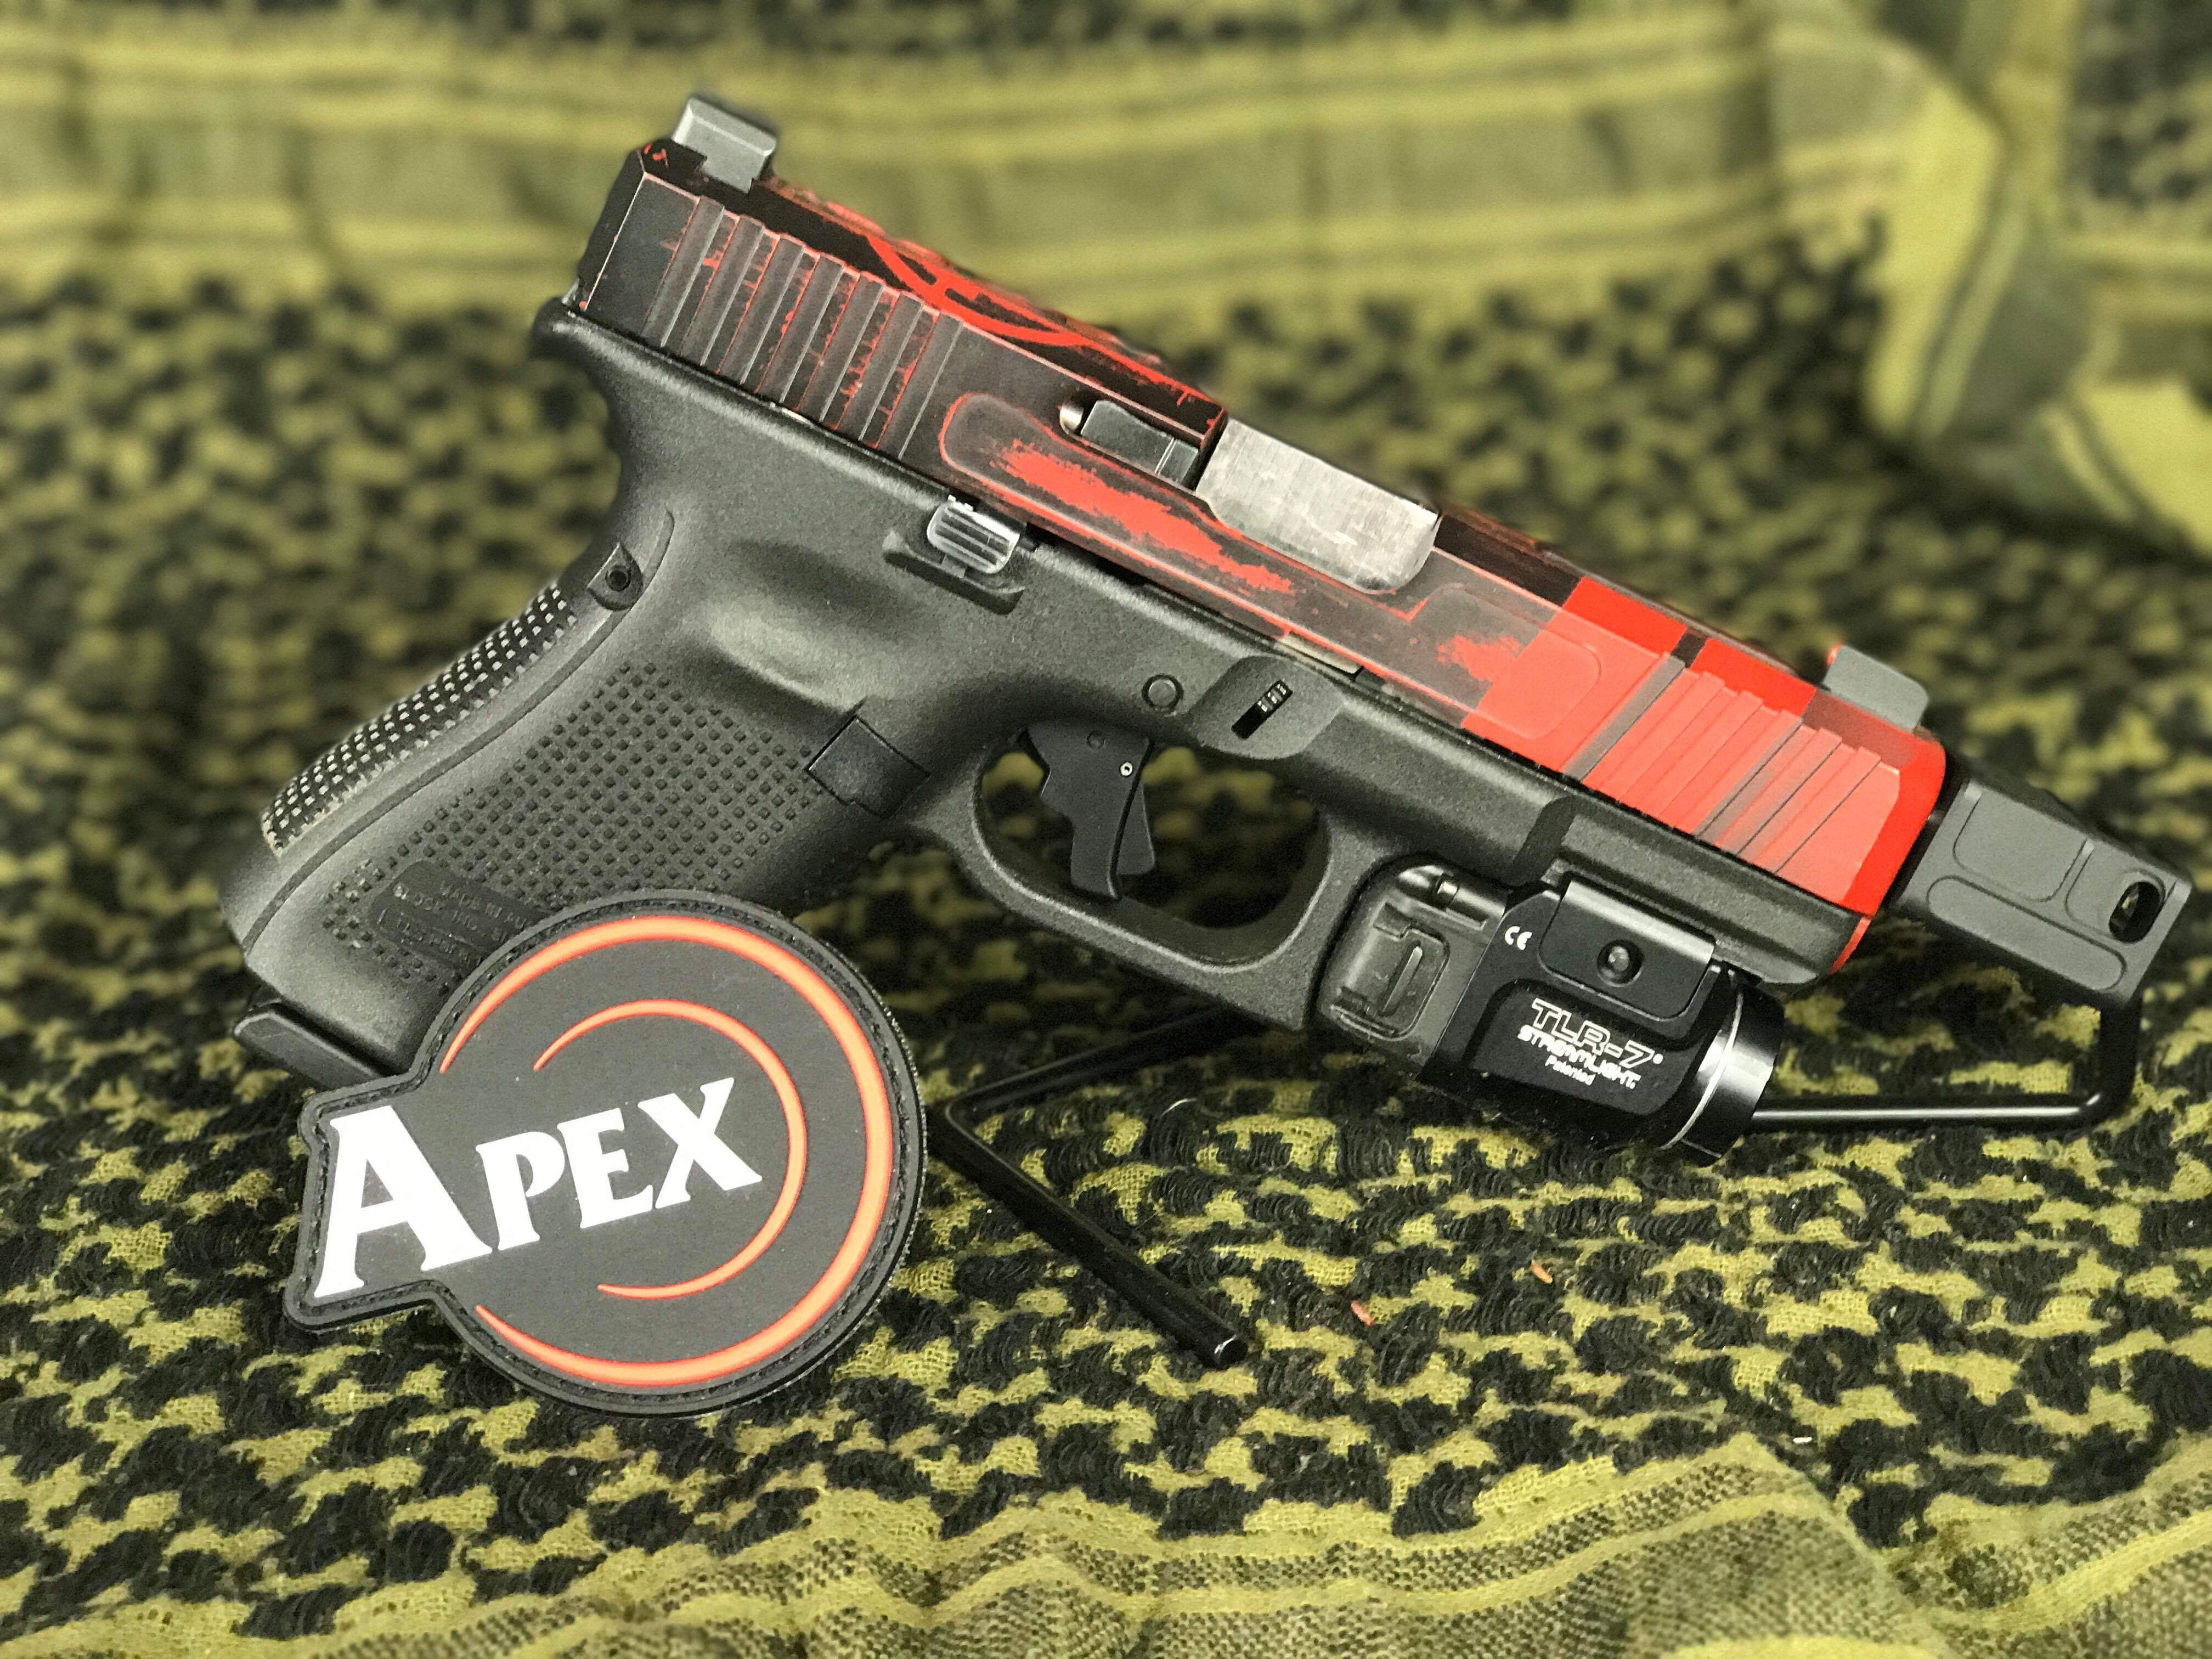 Apex Drop-IN Glock Gen 5 Trigger Kit - The Liberty Report